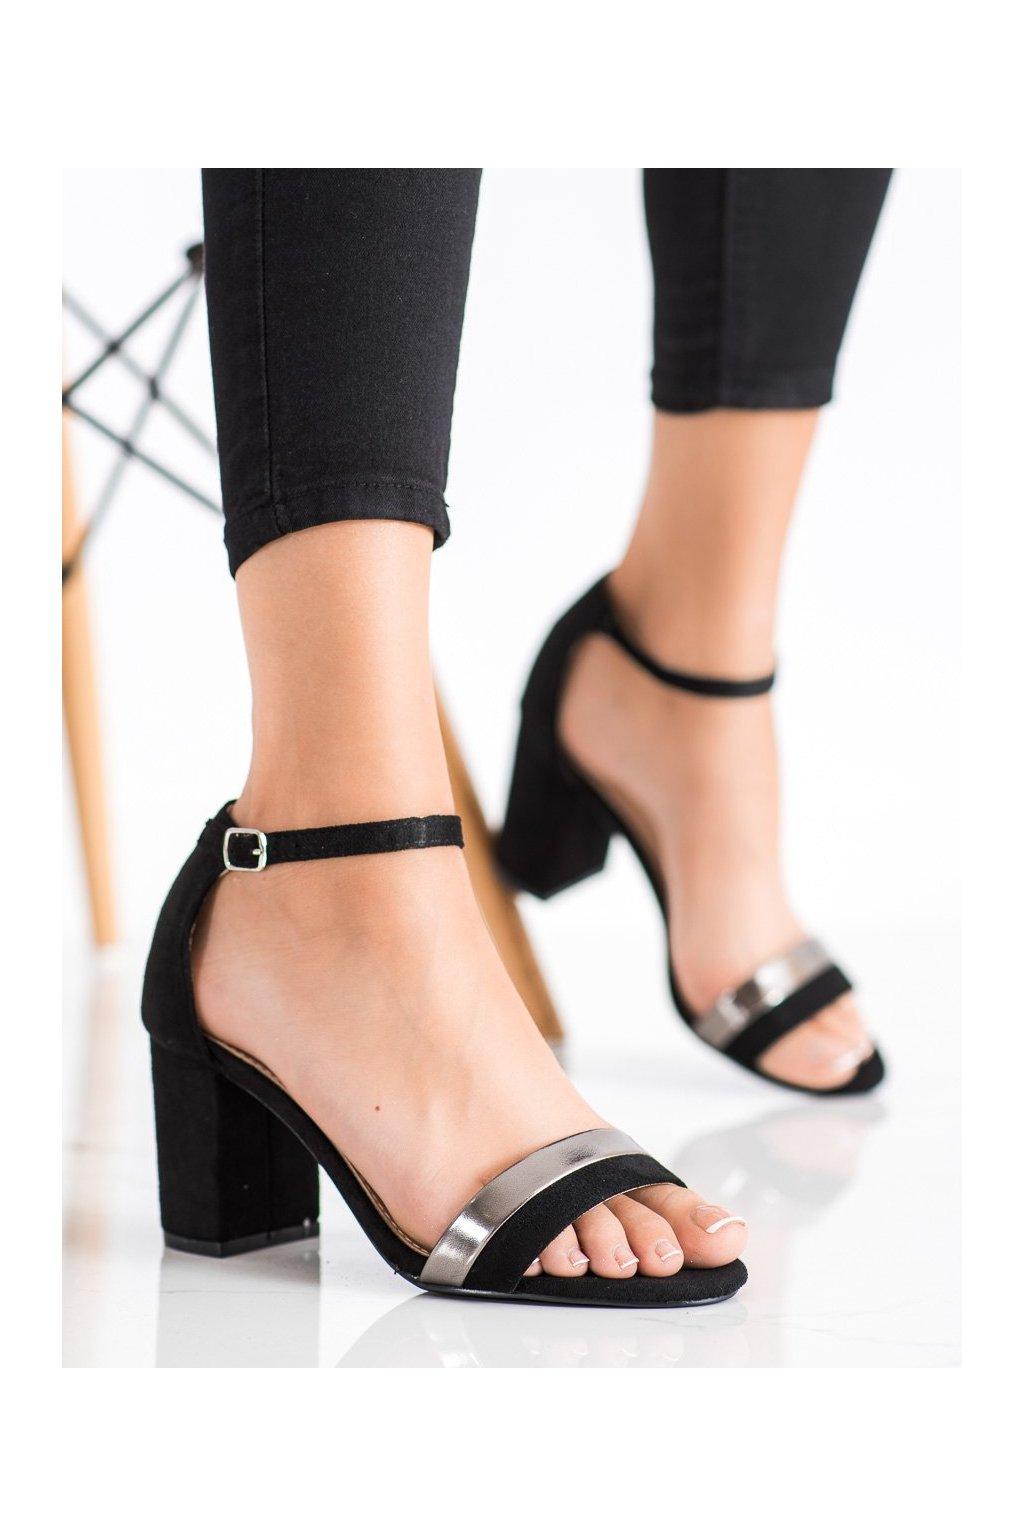 Čierne dámske sandále Laura mode kod QL-110B